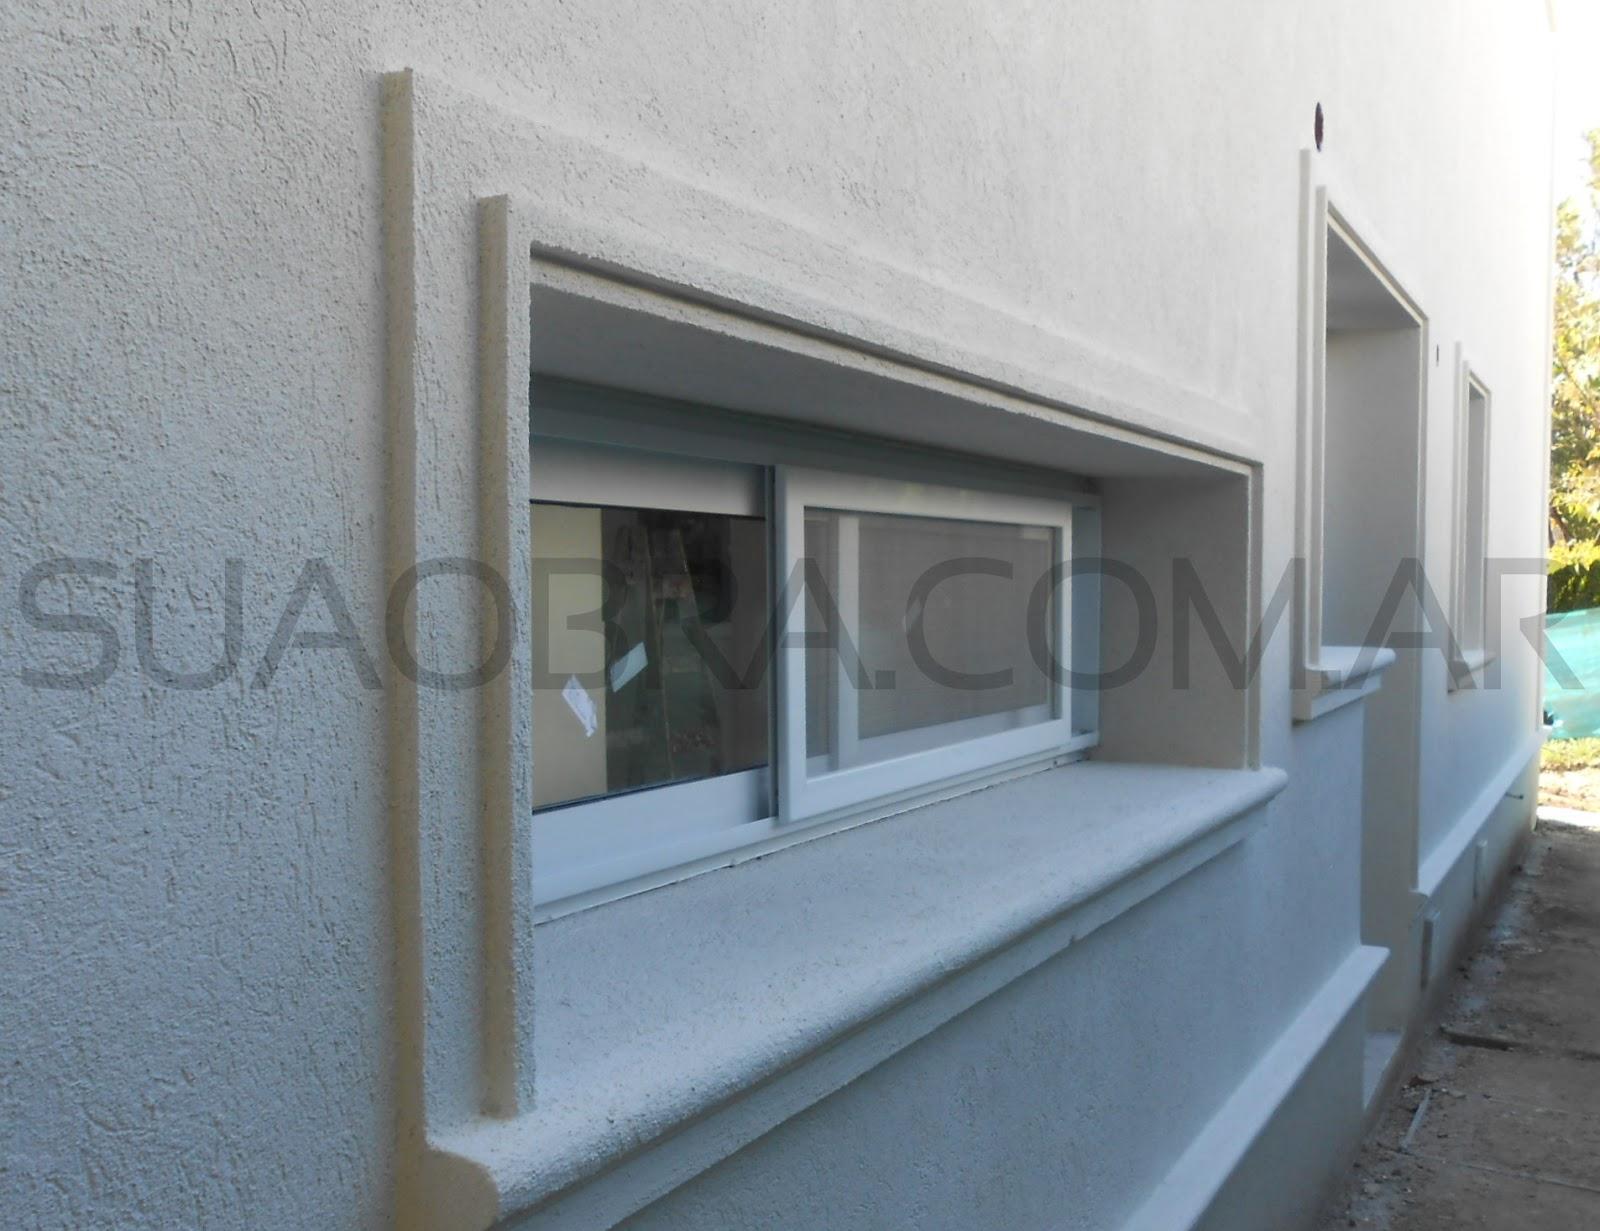 Aplicacion tarquini revestimiento exterior de paredes - Aplicacion colores paredes ...